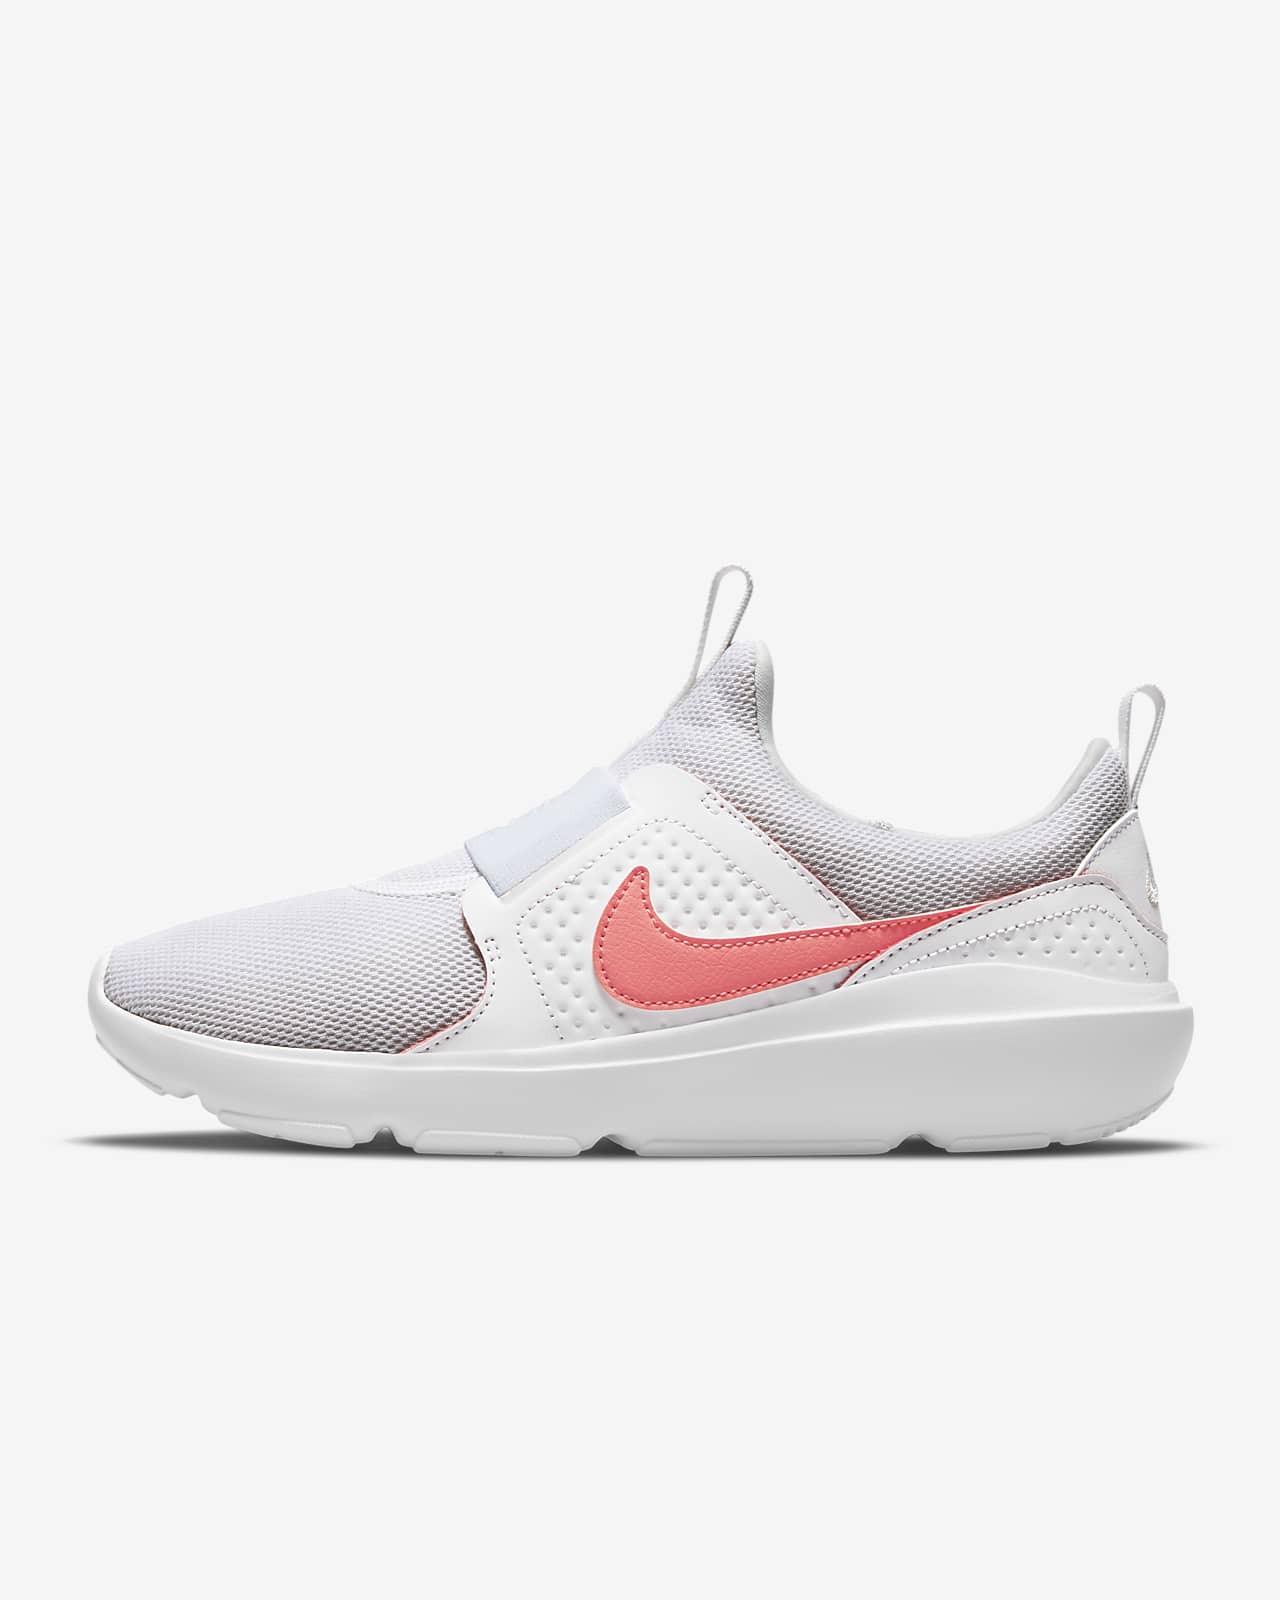 Nike AD Comfort Women's Shoes